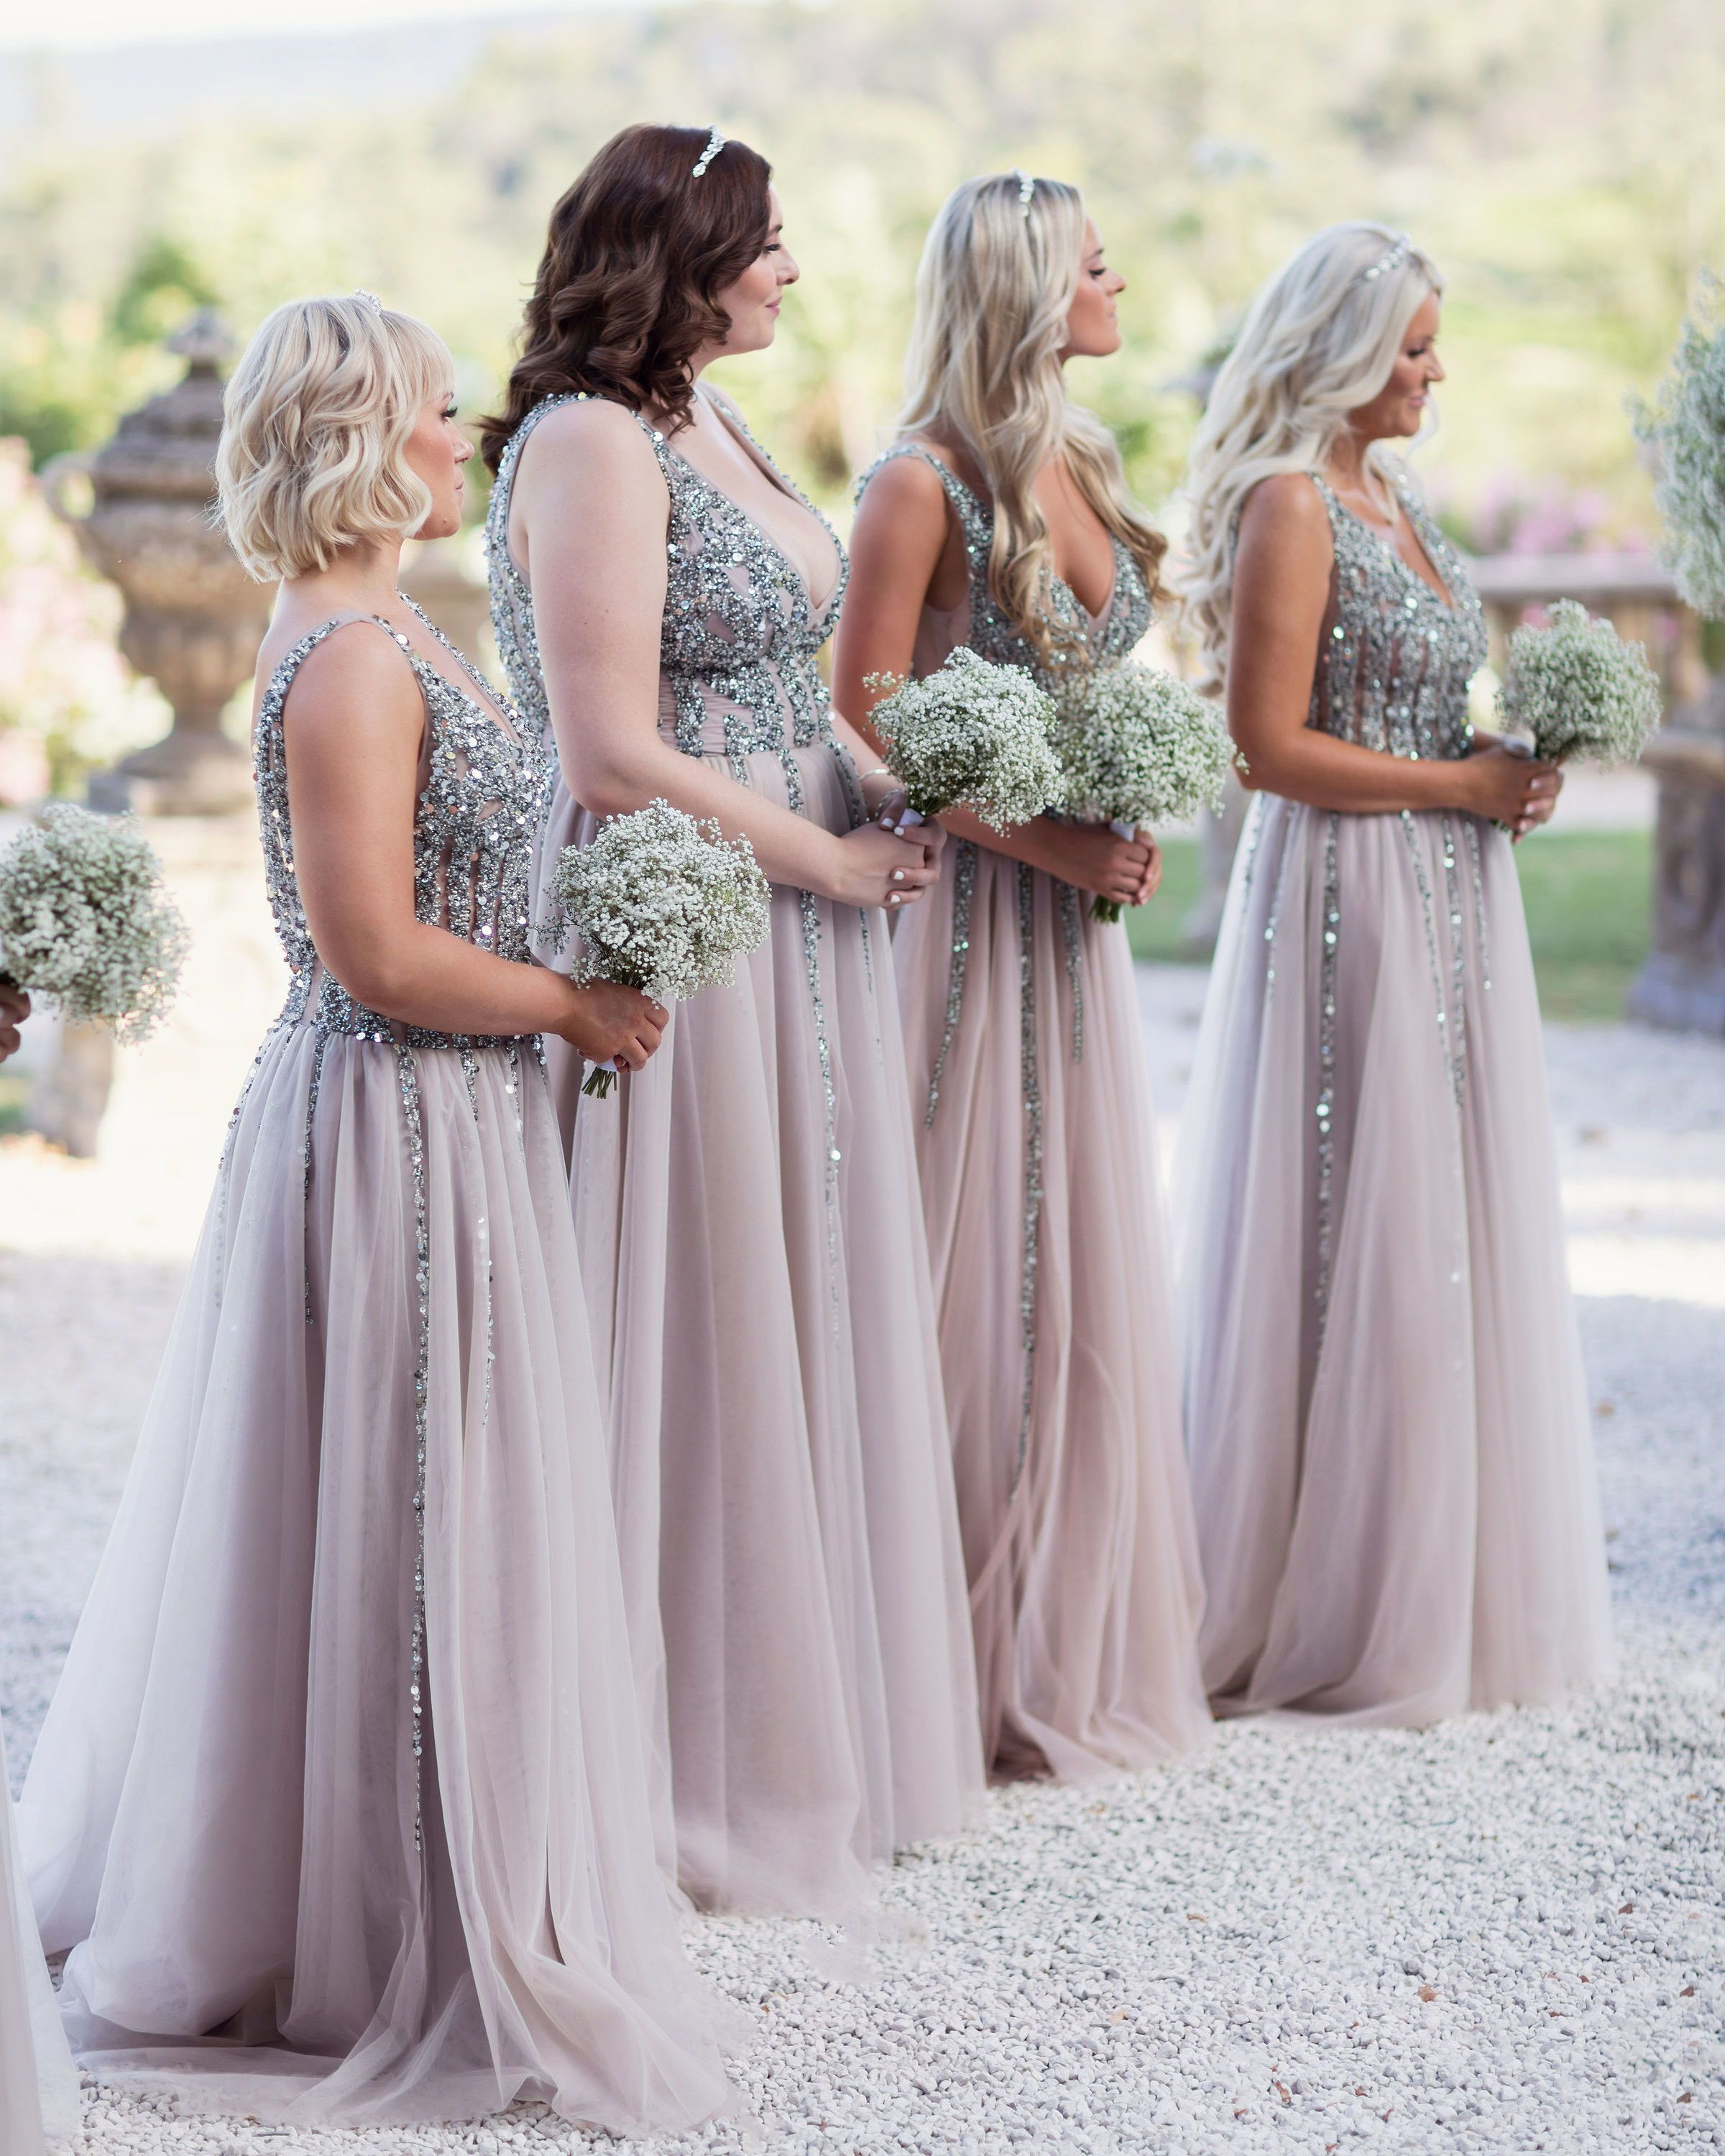 Modern Chic Galaxy Inspired Wedding Ideas Sparkle Wedding Dress Glam Wedding Dress Sparkly Reception Dress [ 1498 x 1000 Pixel ]